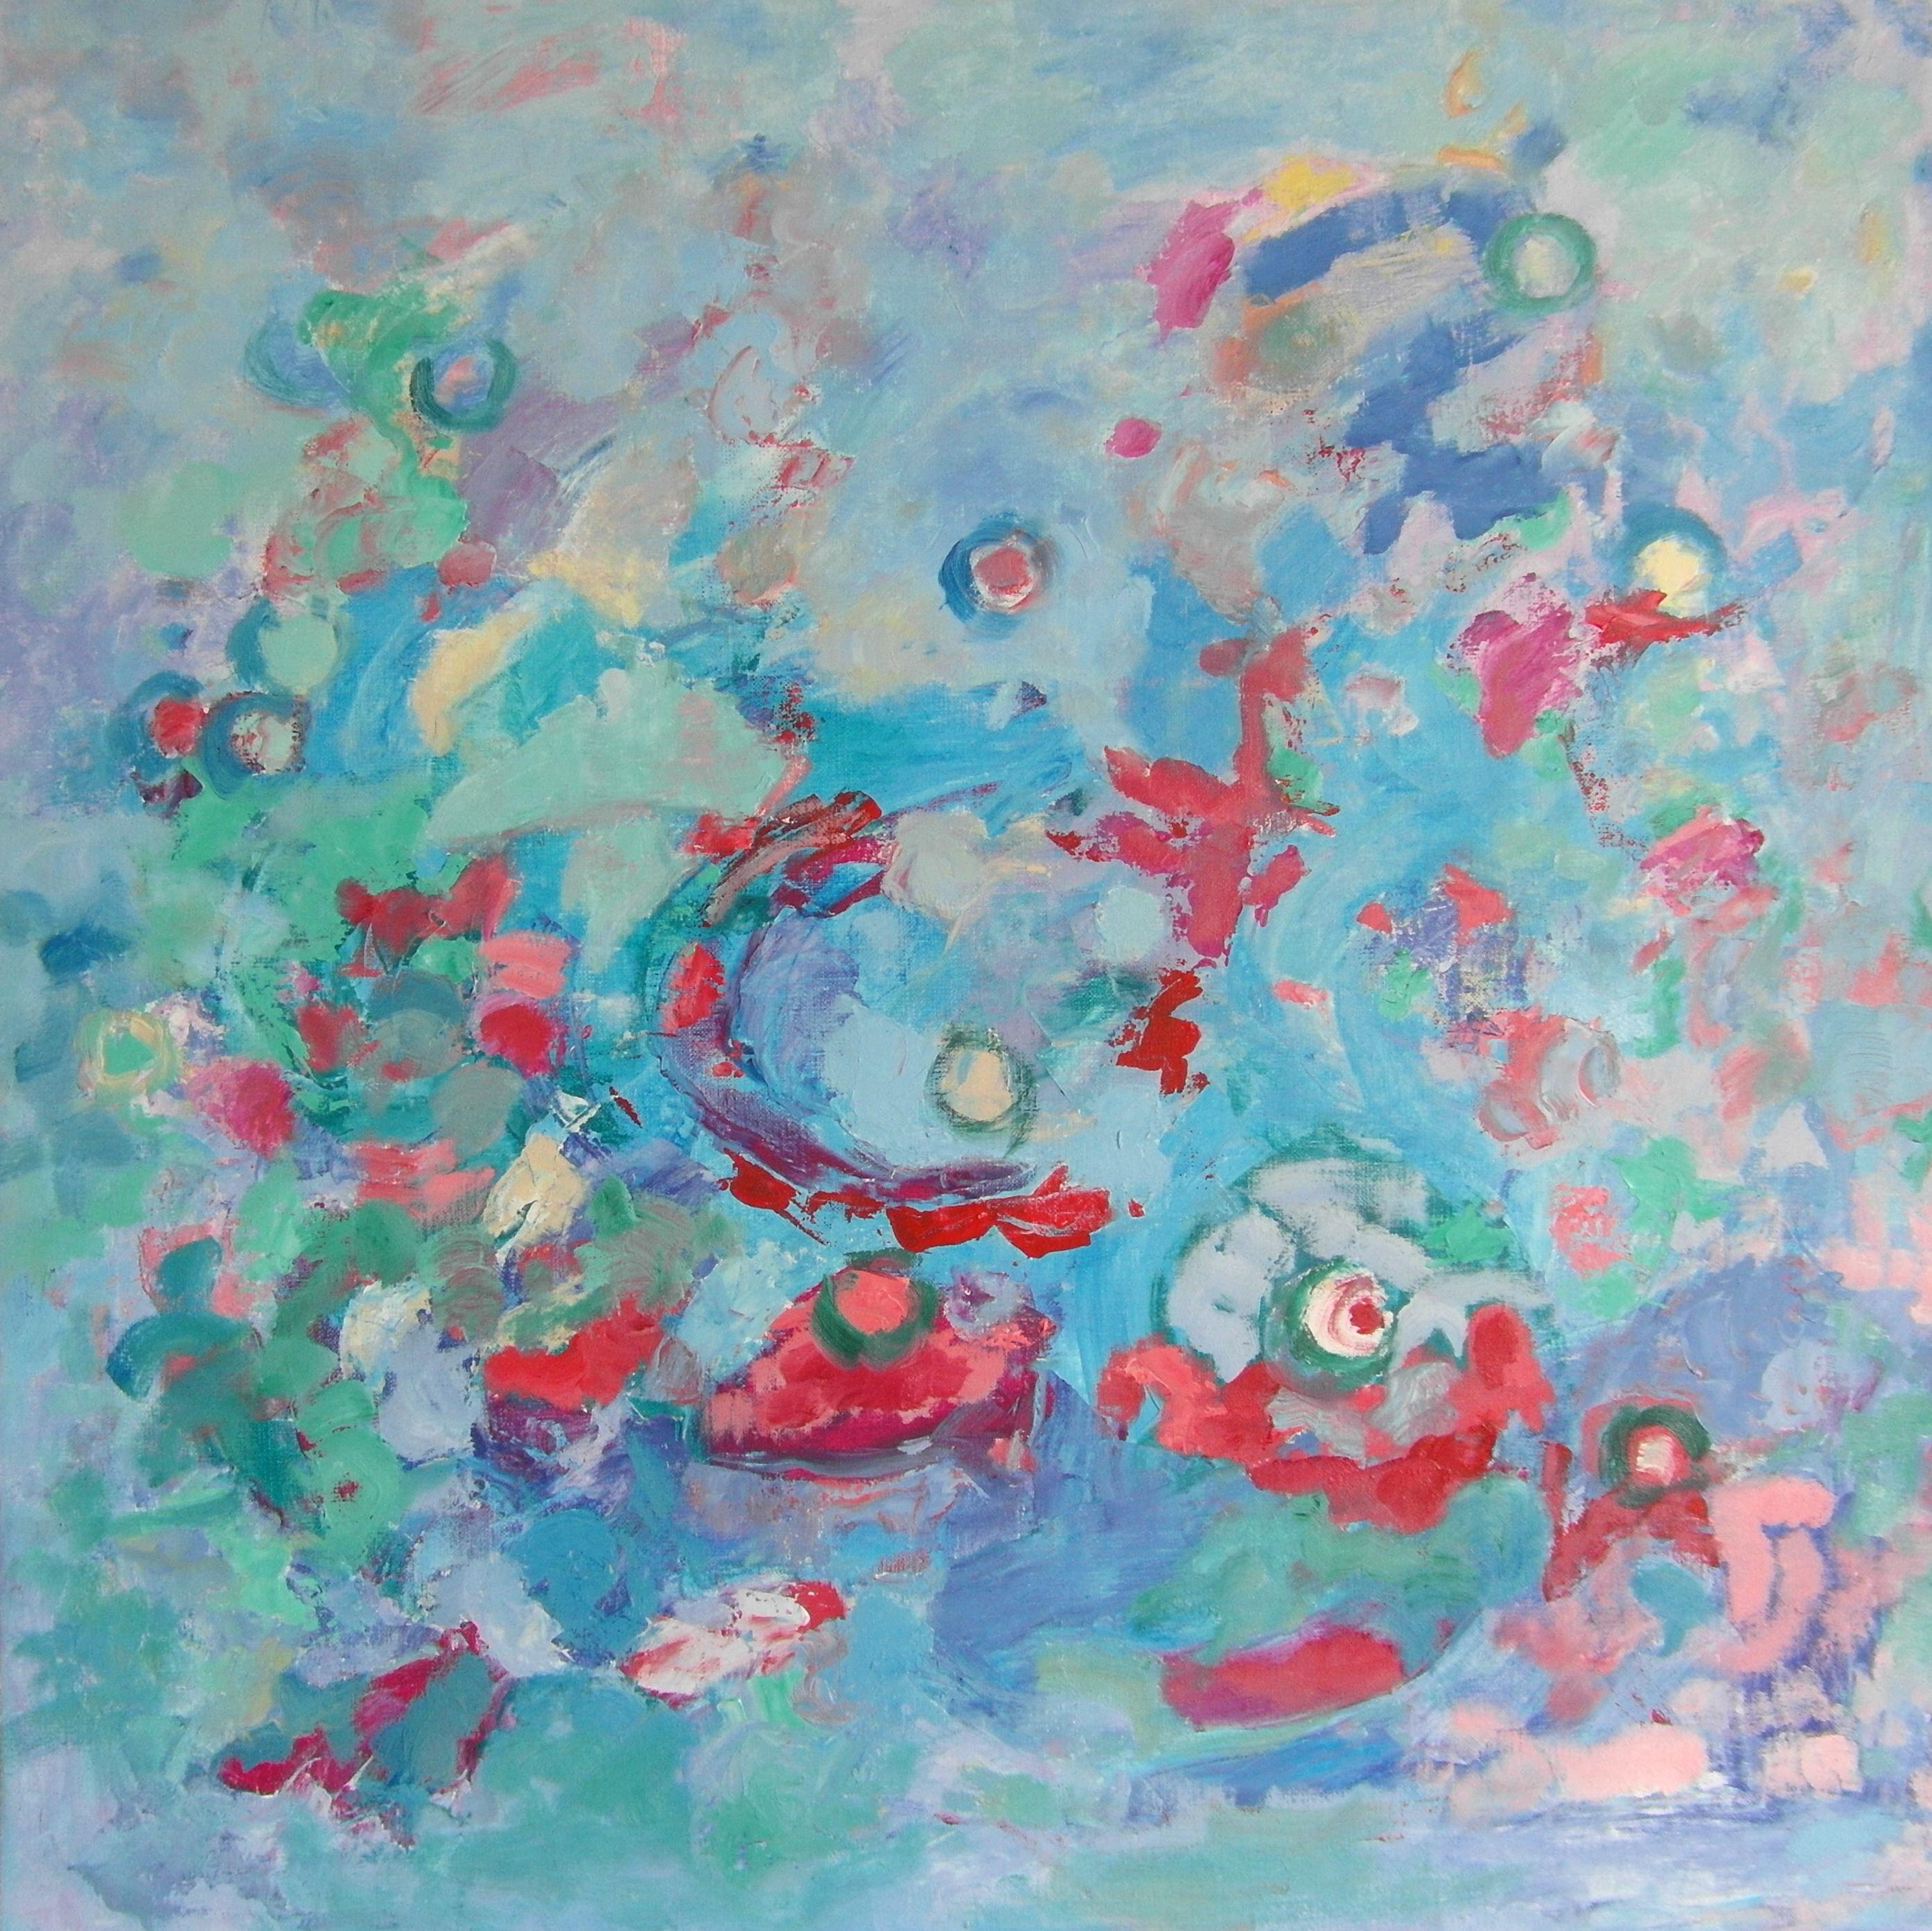 Pintura abstracta. ANTEPASADO UNIVERSAL. Óleo sobre lienzo 60 x 60